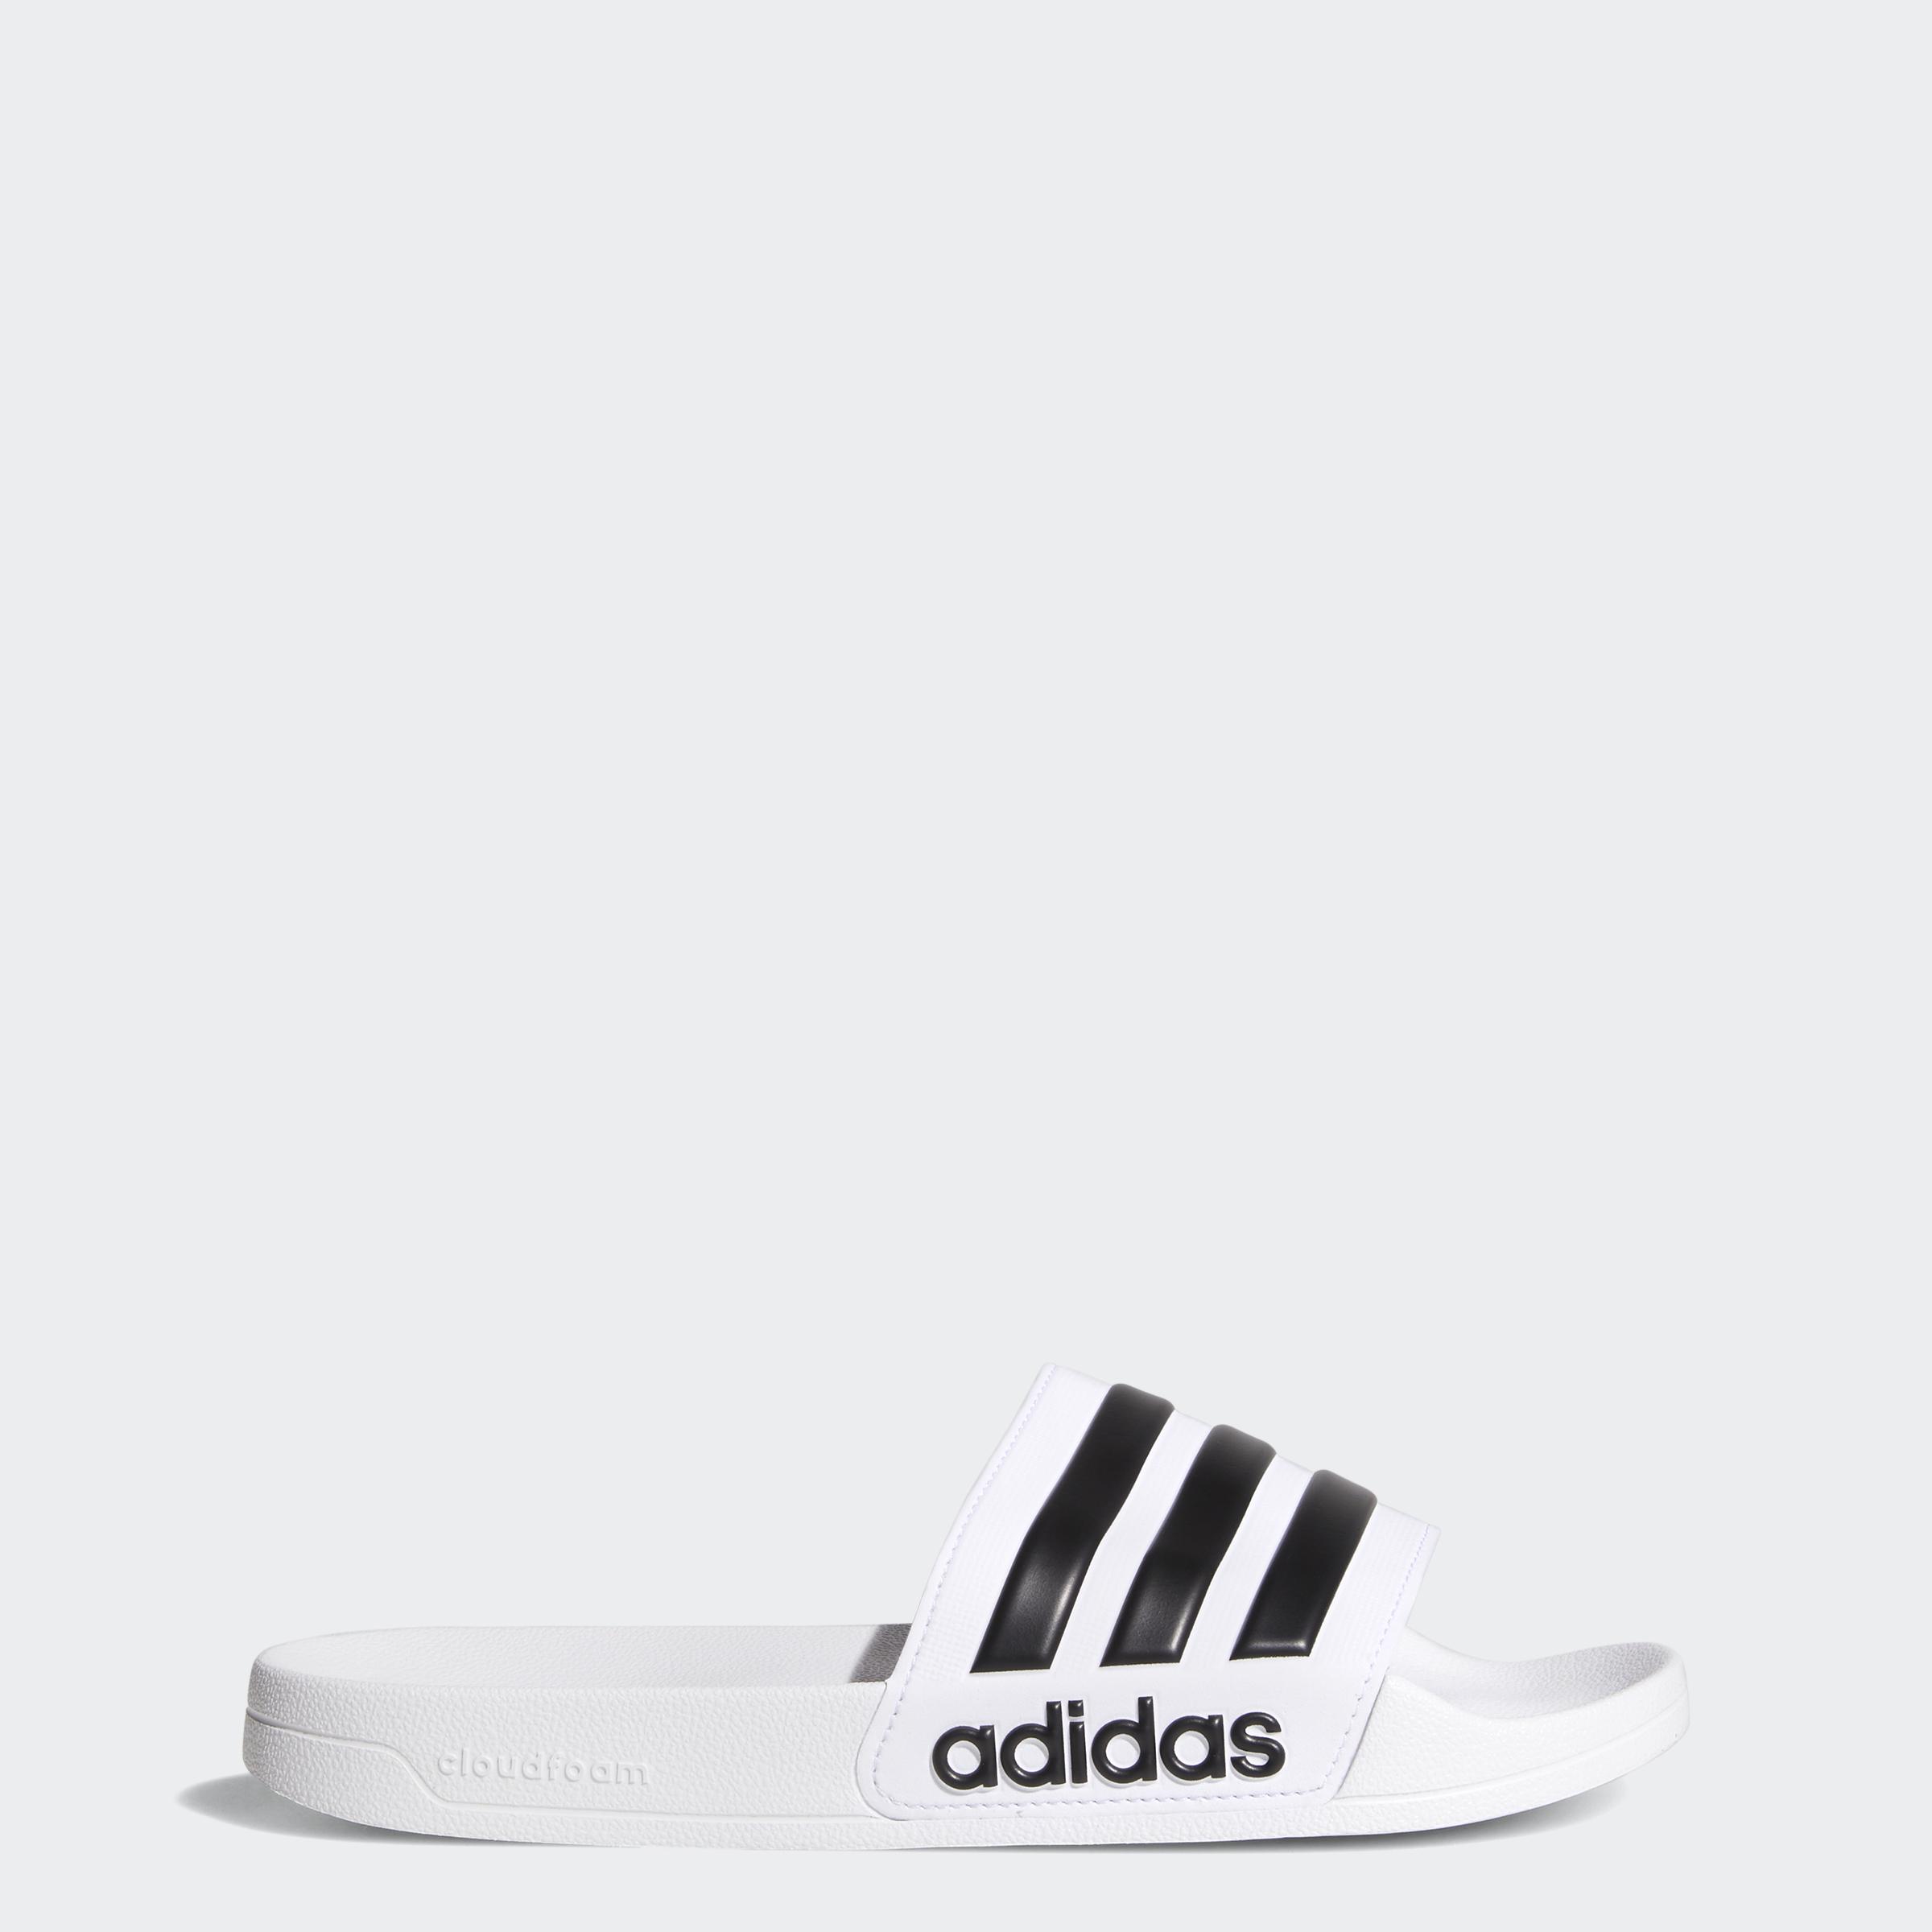 adidas-Adilette-Cloudfoam-Slides-Men-039-s thumbnail 16